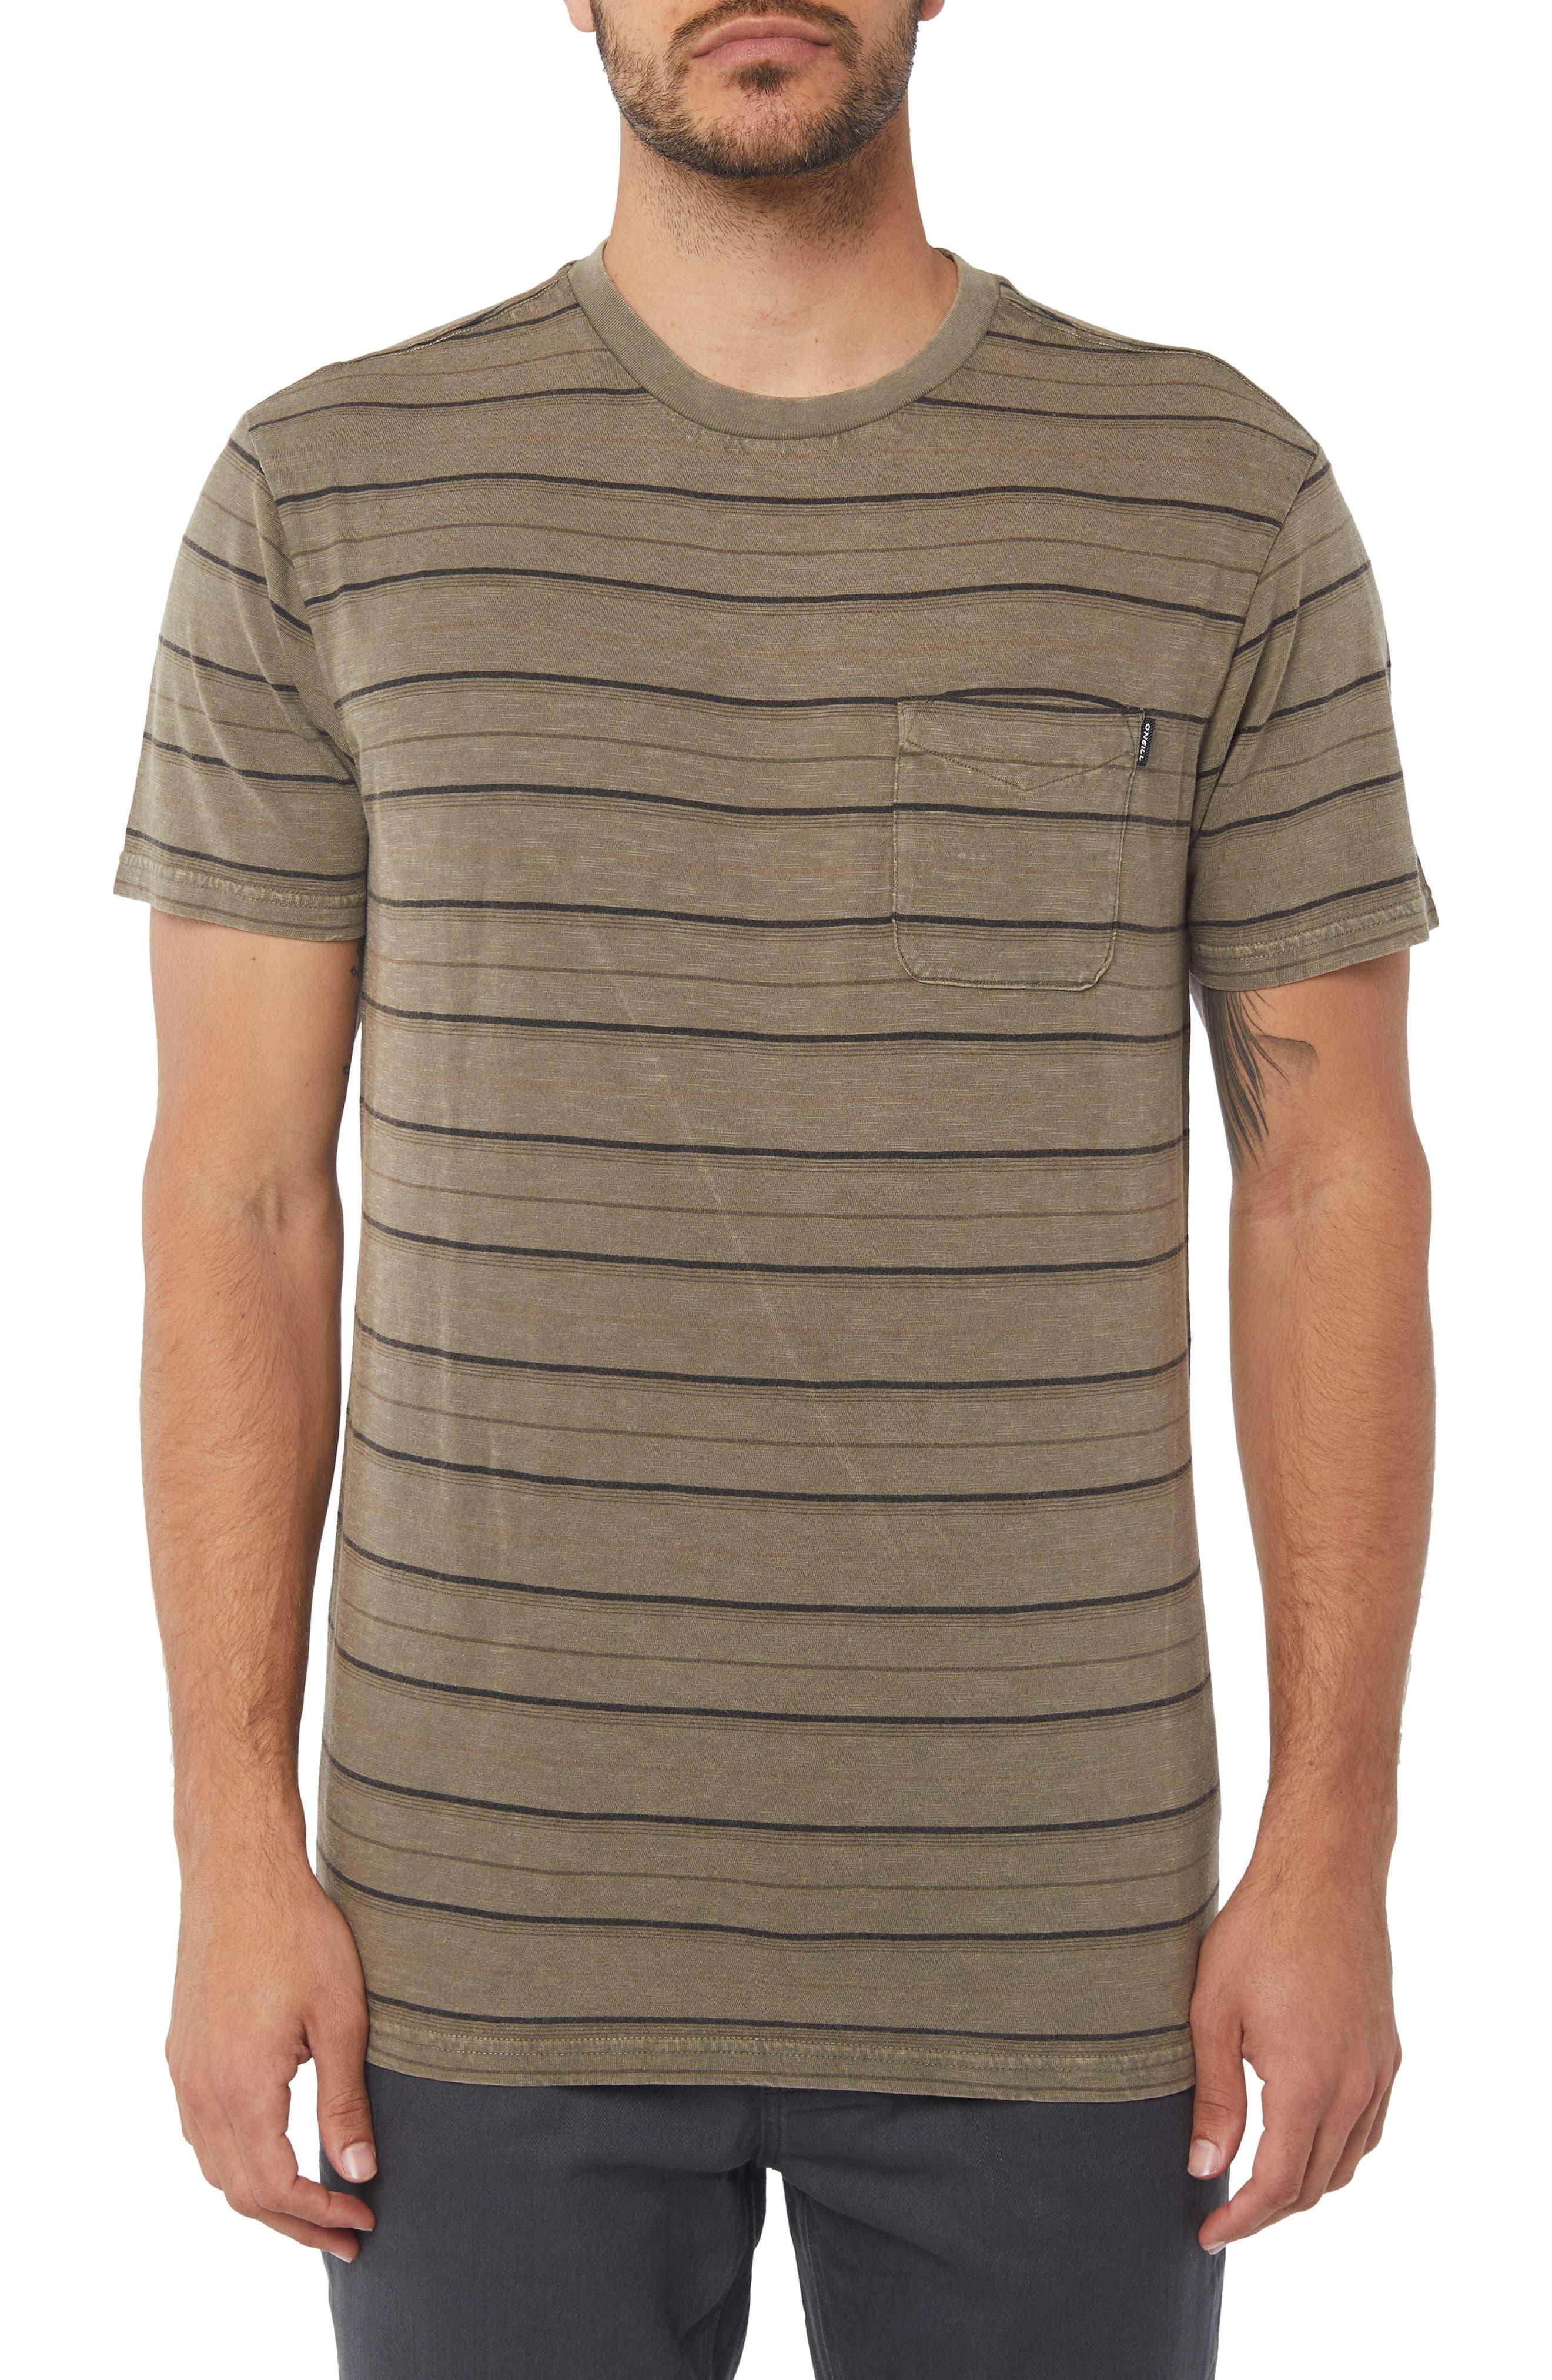 O'Neil Detroit Dinsmore Crew T-shirt,                         Main,                         color, MILITARY